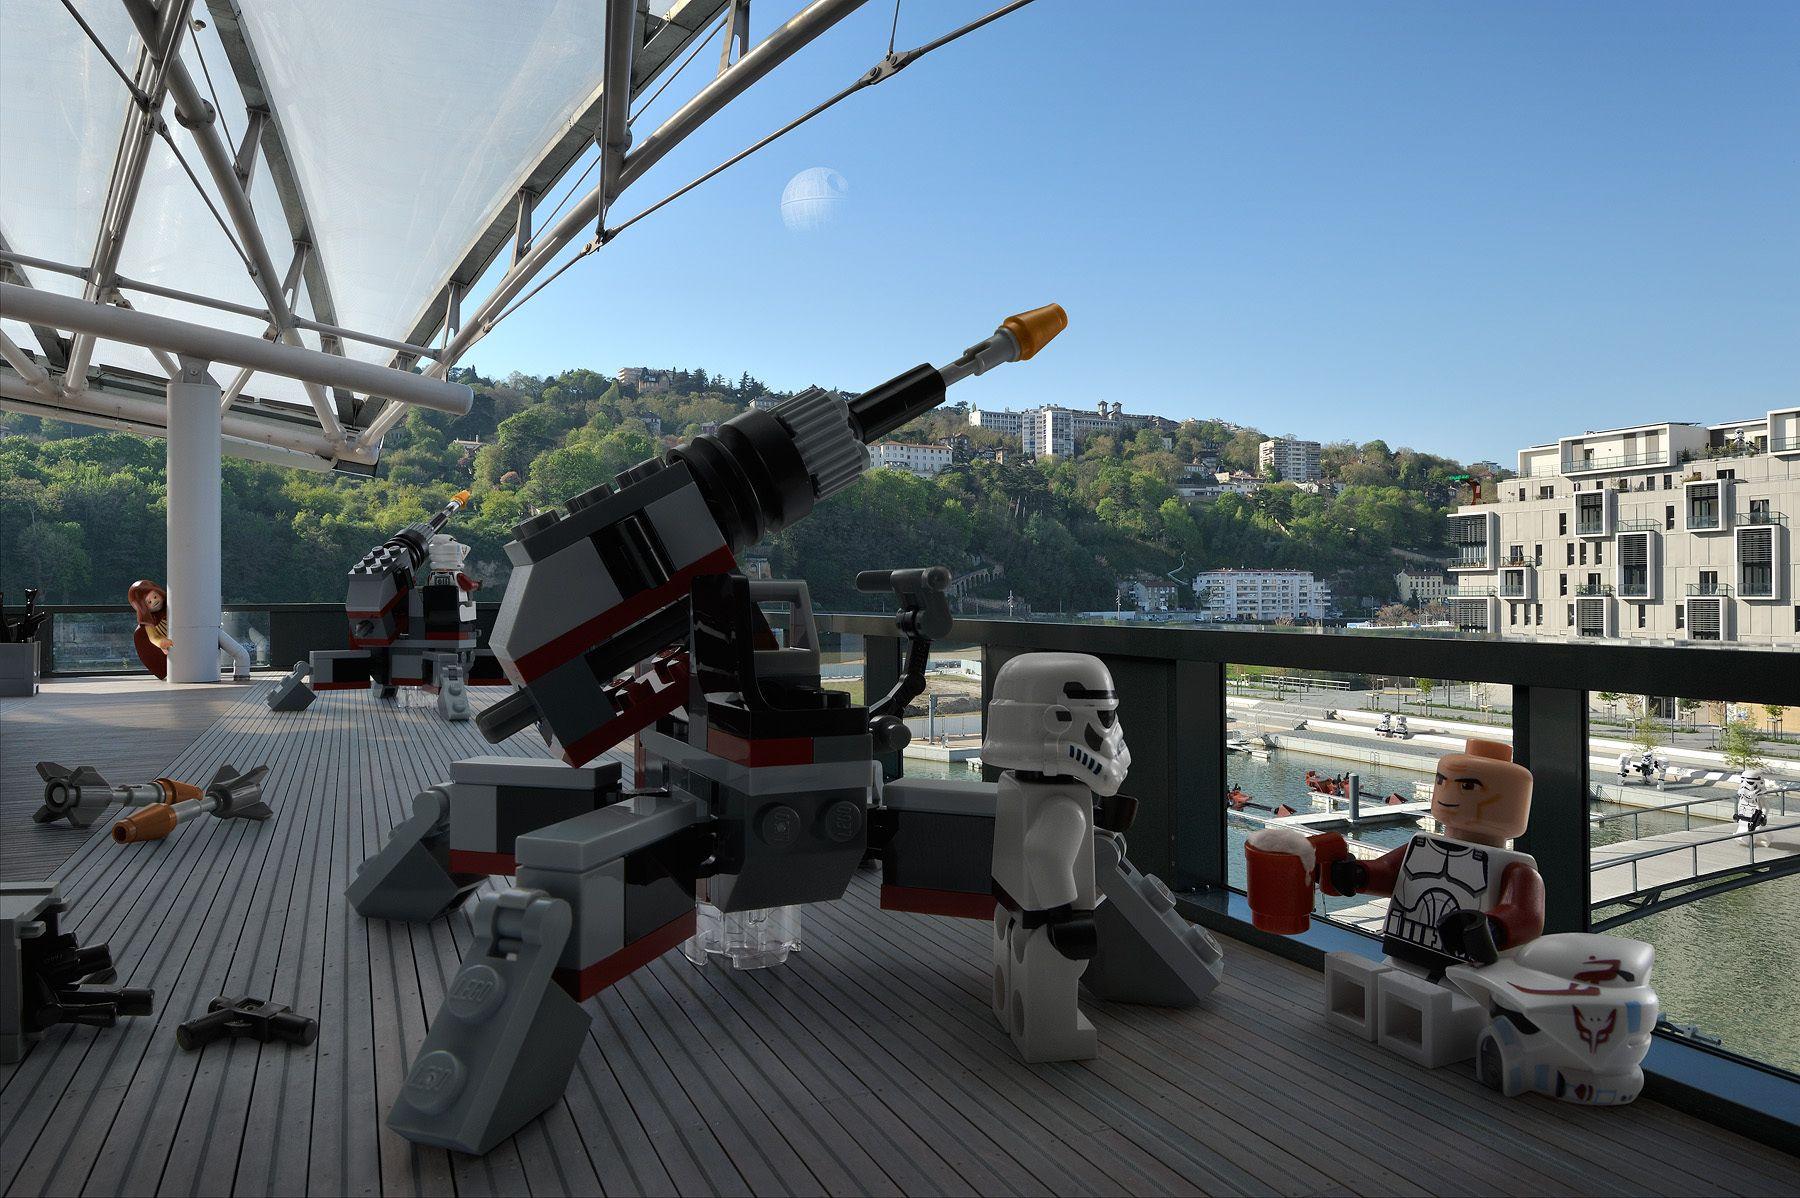 Toys Invasion #02 - © Benoit Lapray - © Matthieu Latry (post production) - © The LEGO Group. - © 2013 Lucas Film Ltd. & TM.